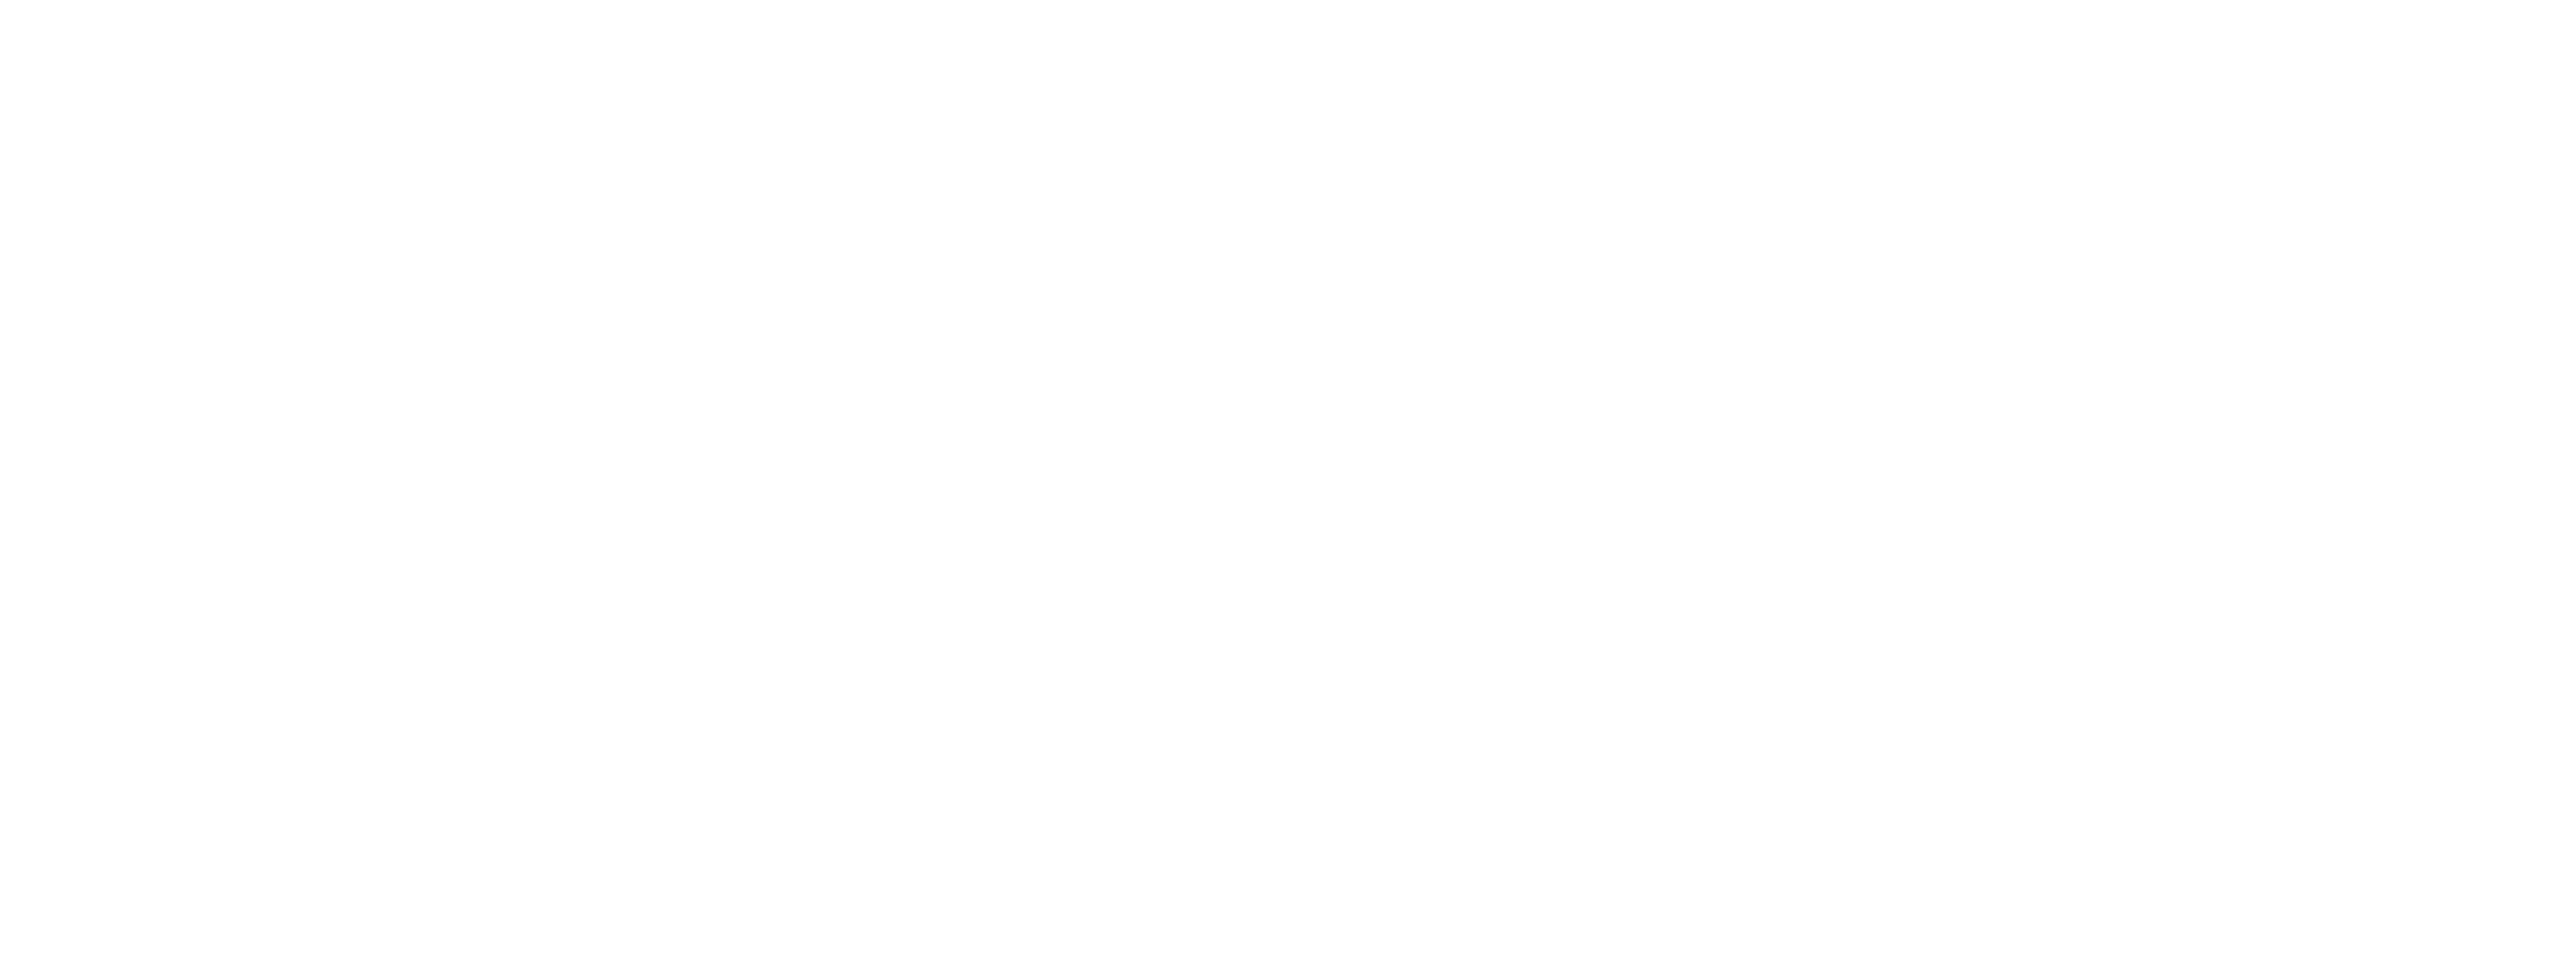 UK South Africa Tech Hub white logo